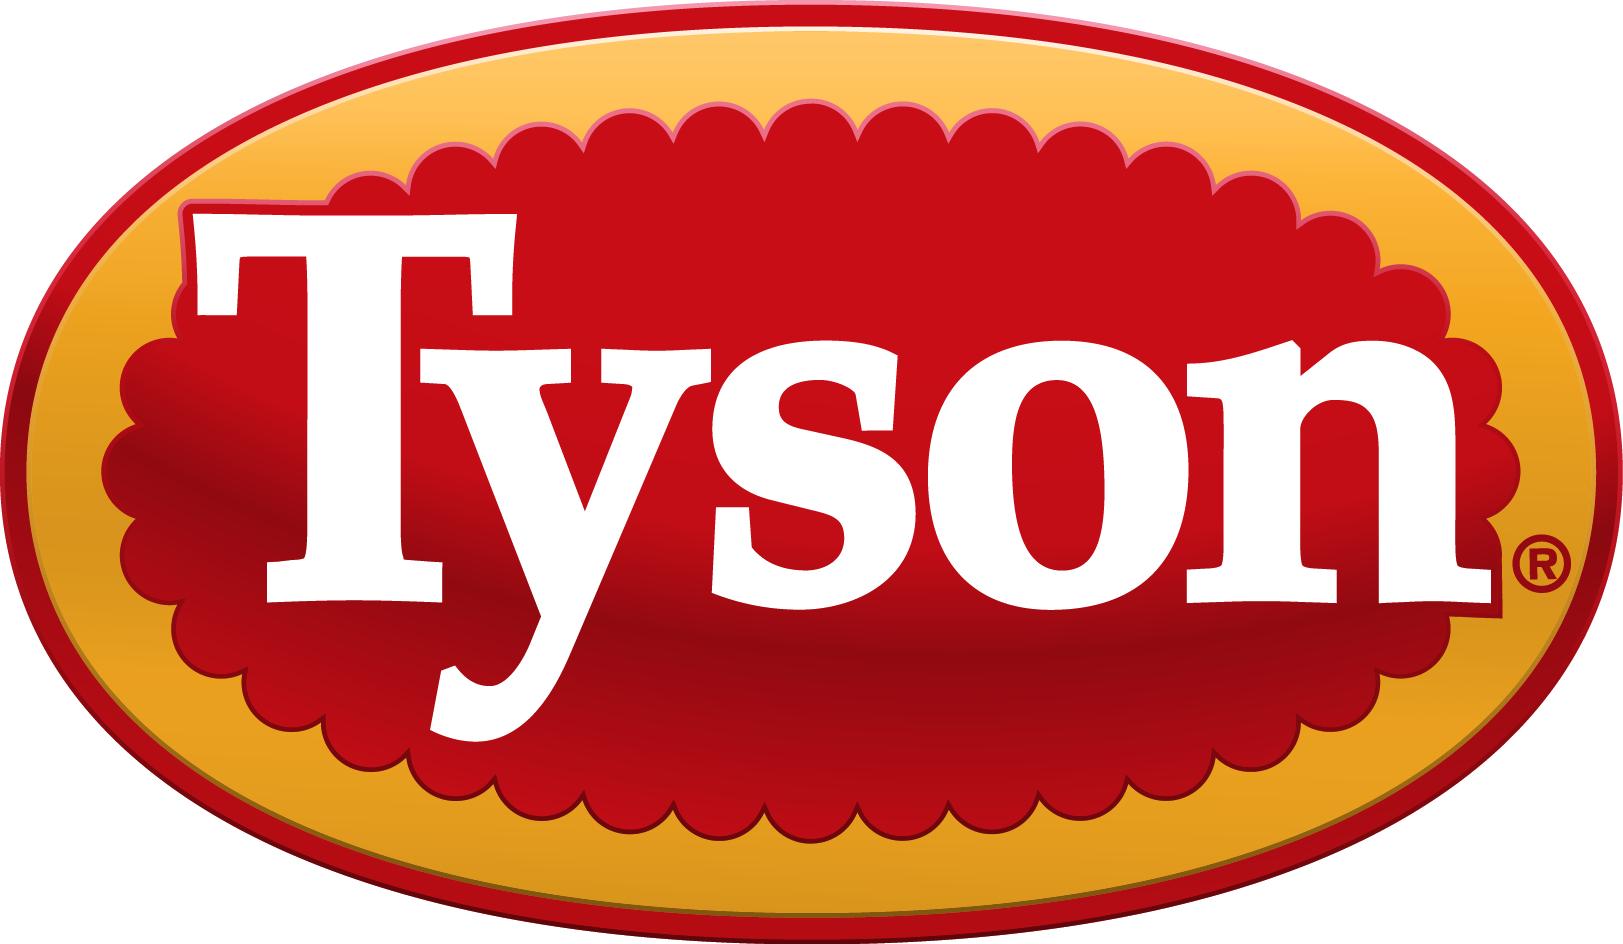 Tyson® Color Logo .JPG